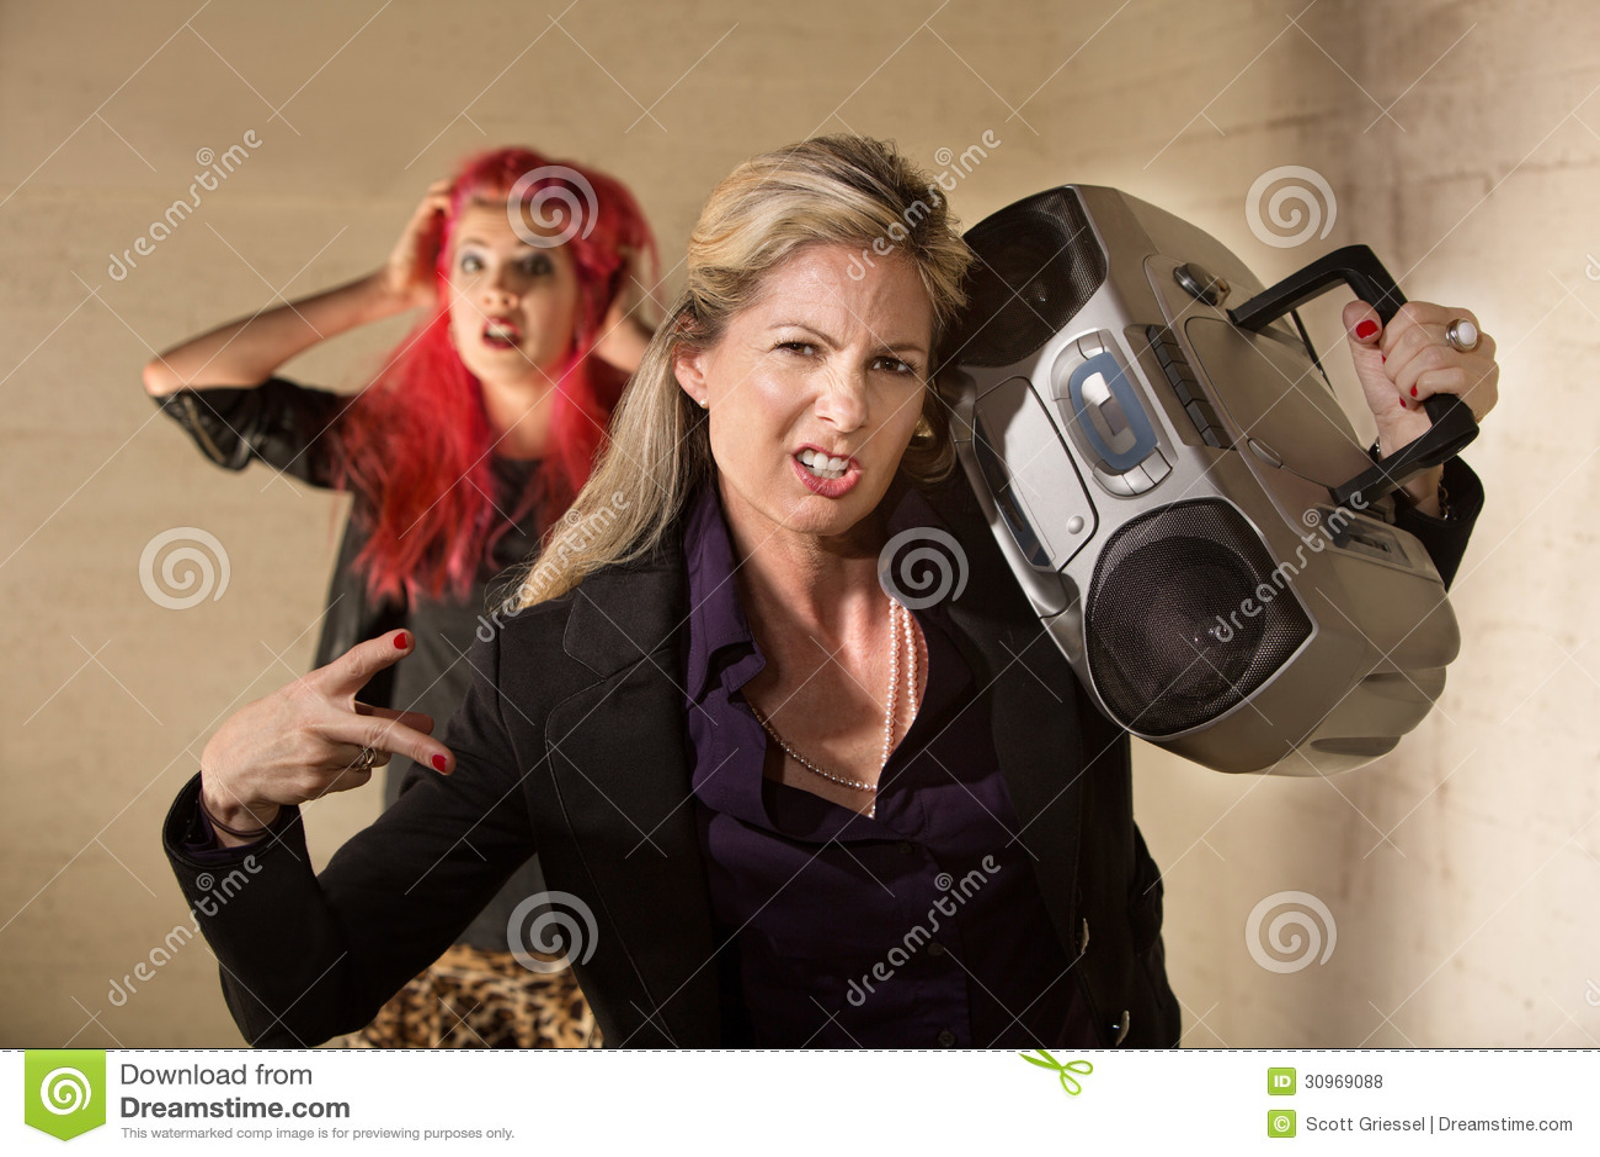 awkward women photos